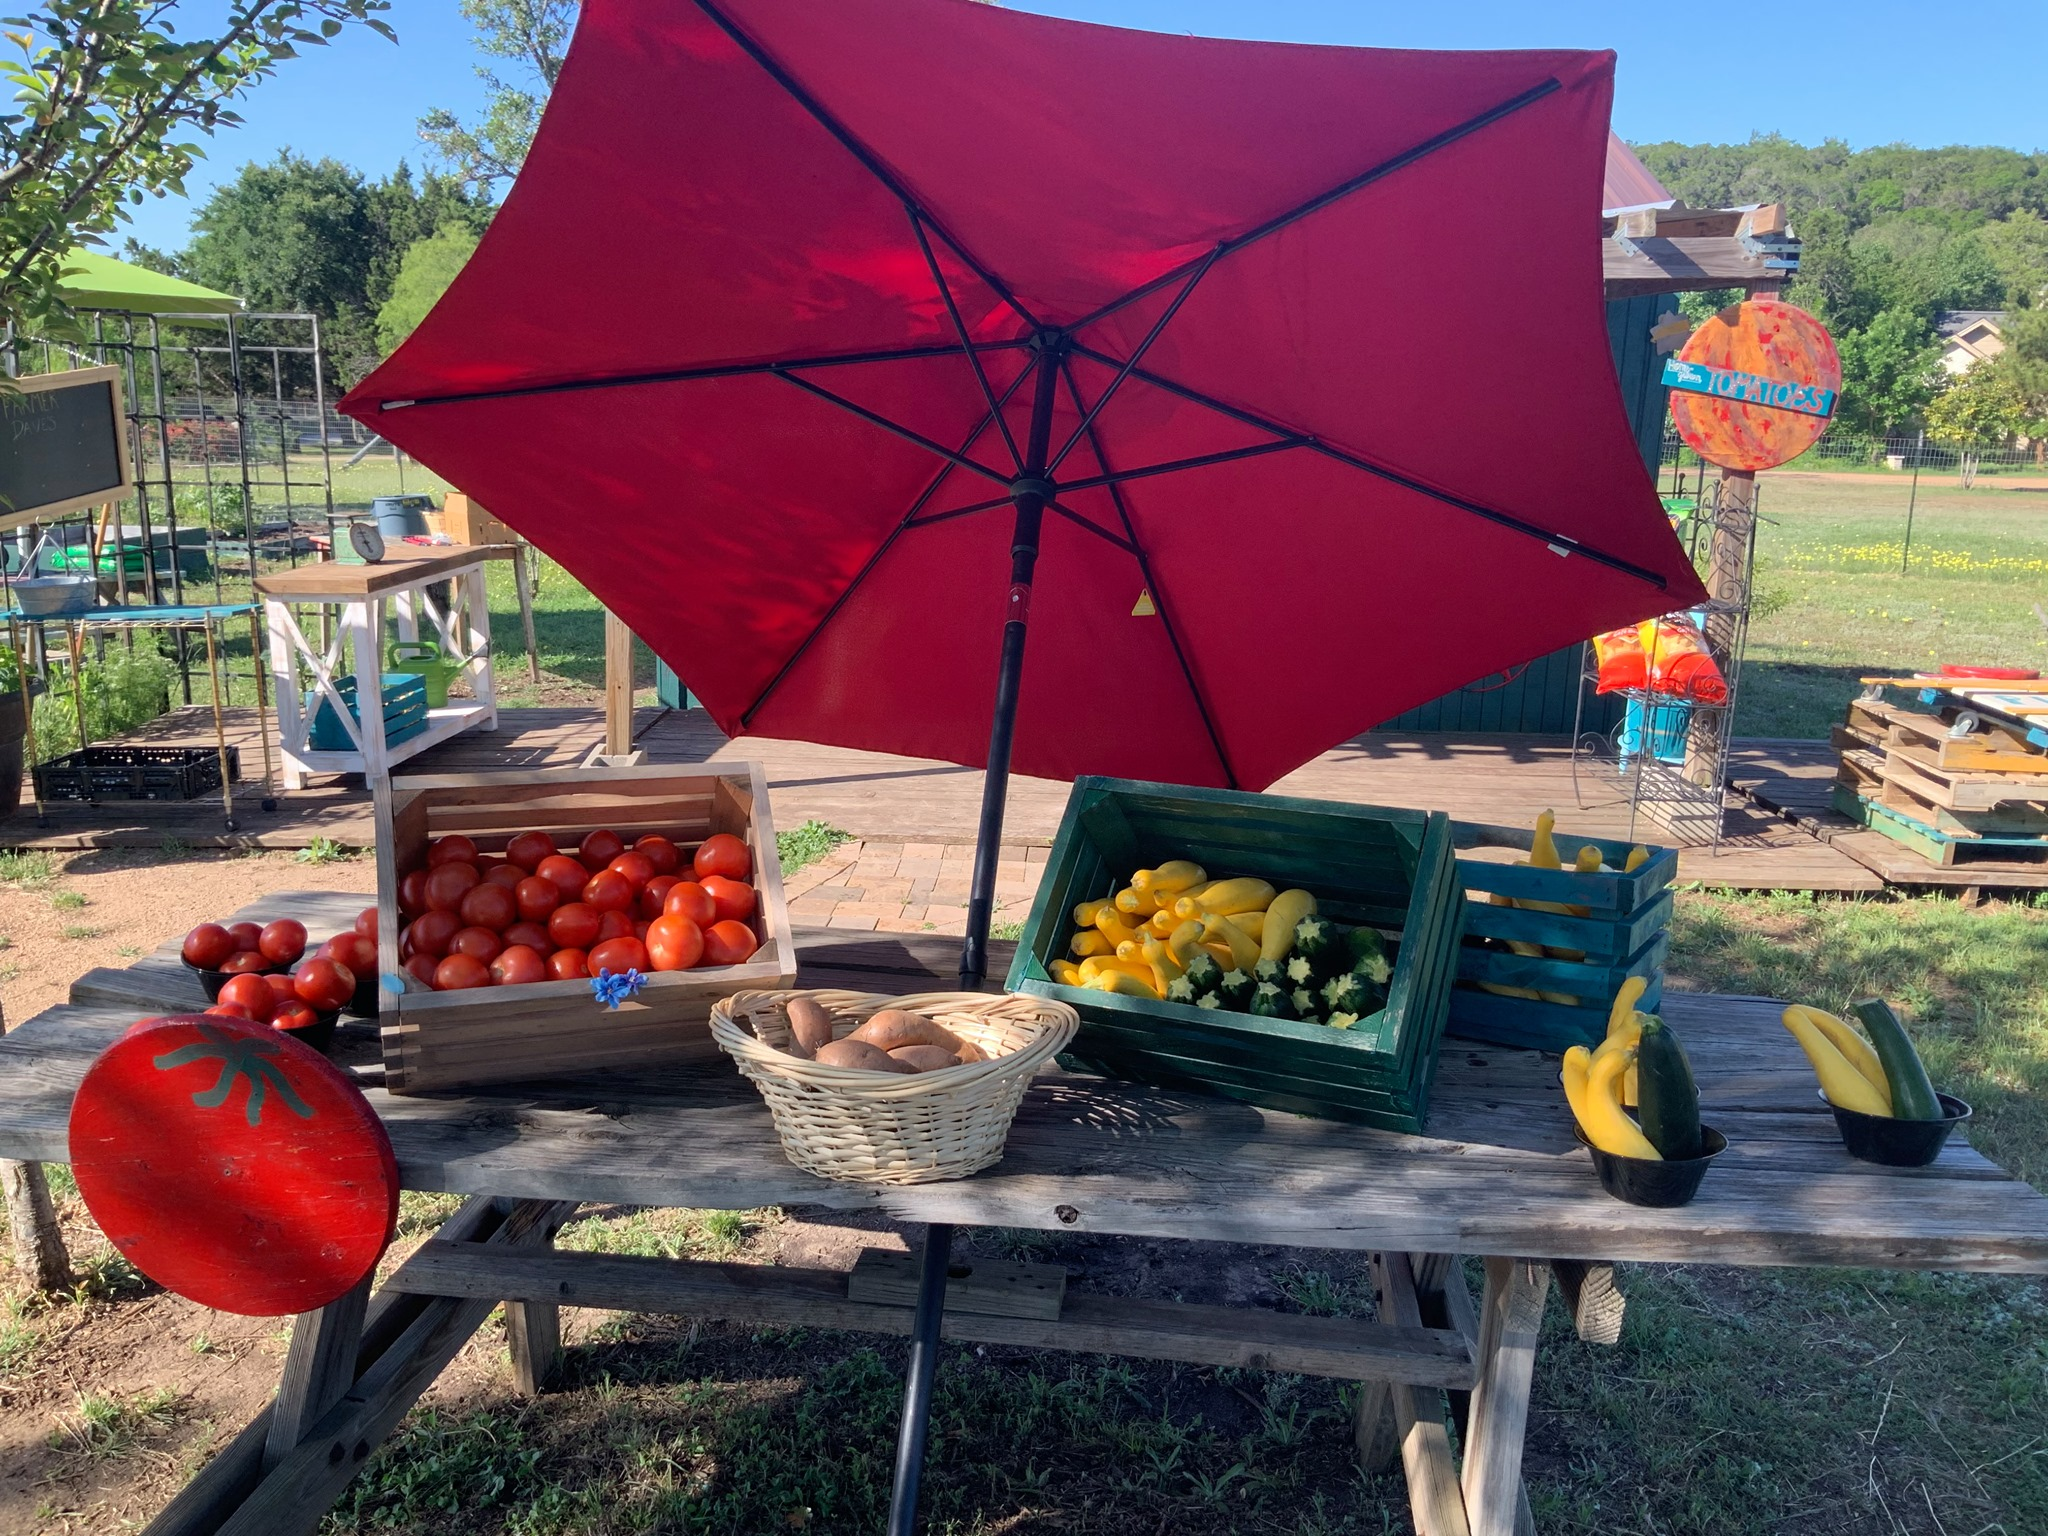 Farmer Dave's Farm Market - Spicewood TX Specialty Grocery